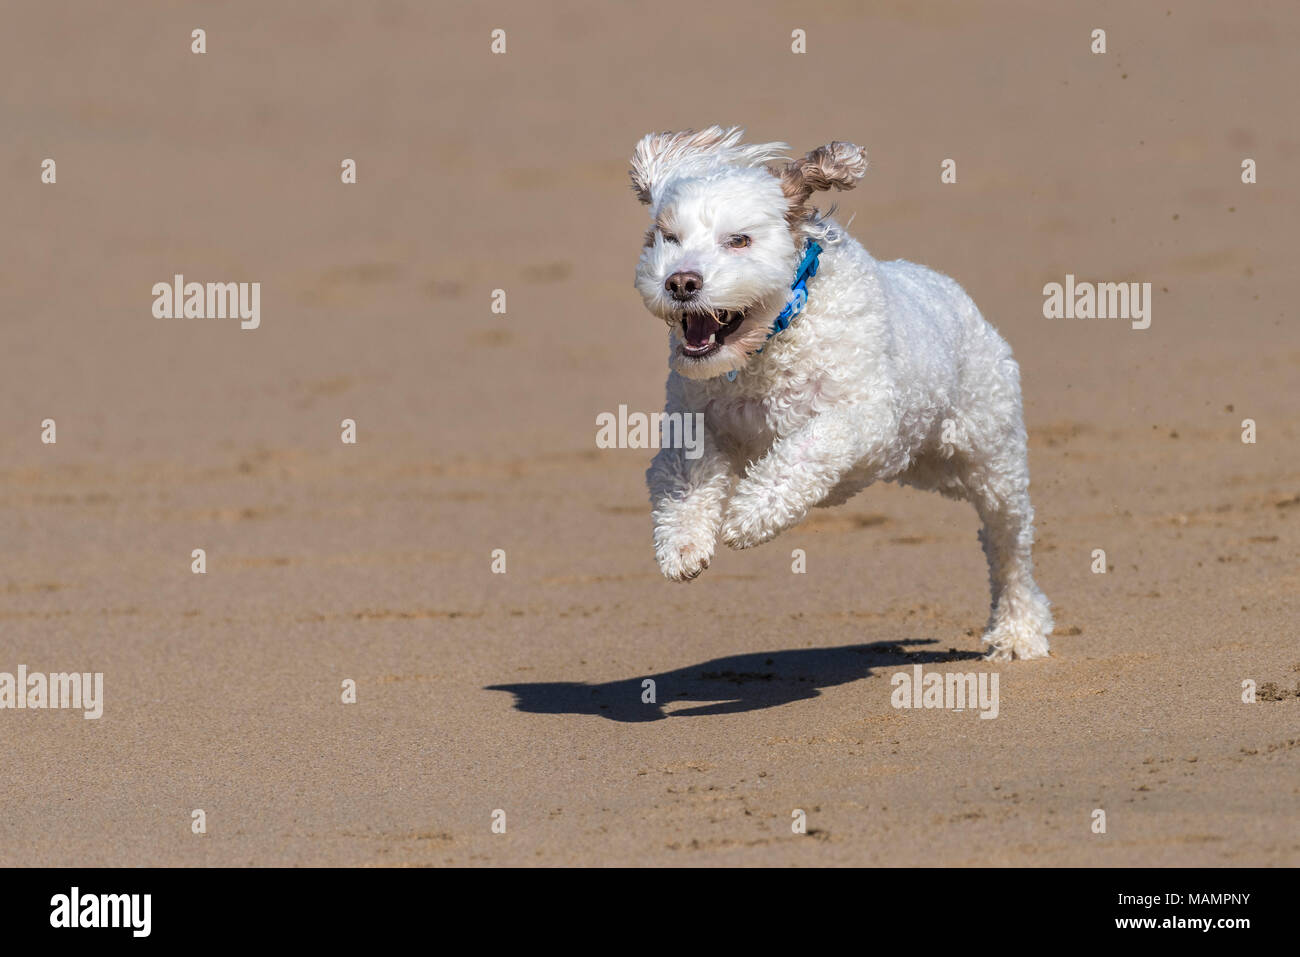 A Cockapoo running across a beach. - Stock Image